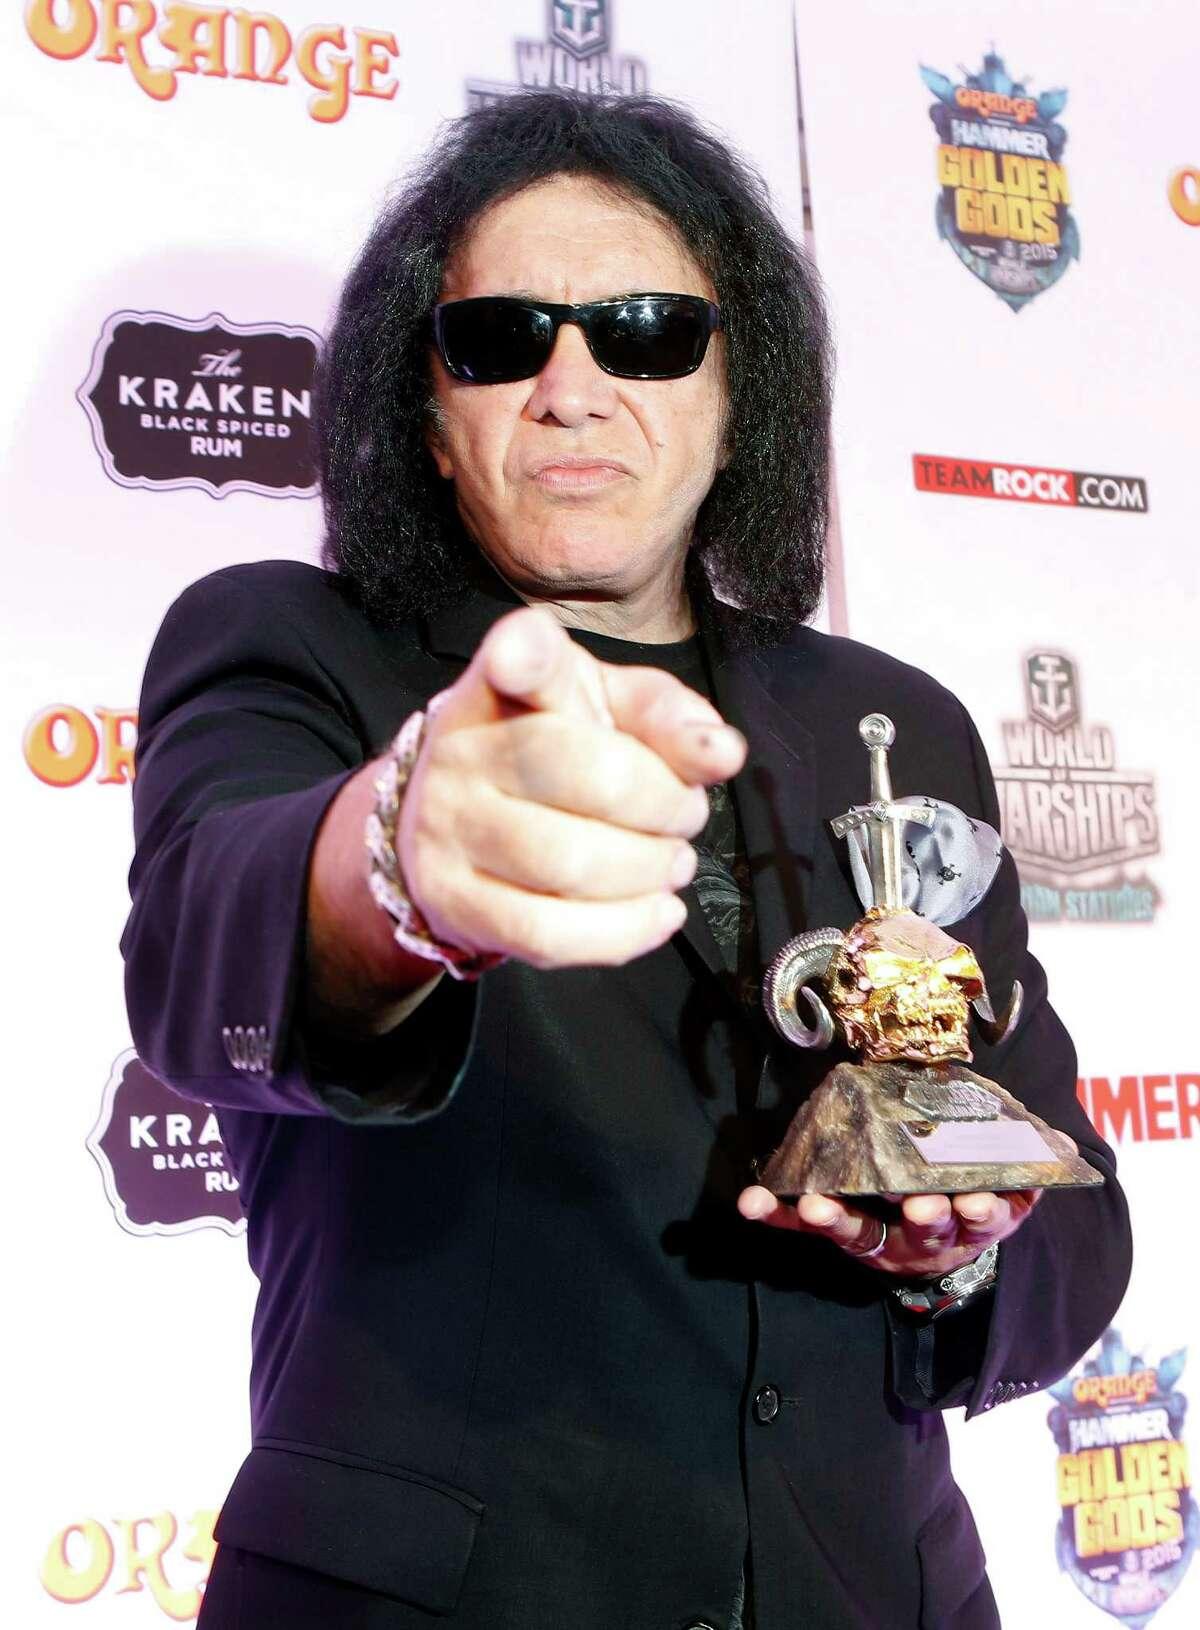 LONDON, ENGLAND - JUNE 15: Gene Simmons of KISS wins Legend Award at the Metal Hammer Golden Gods awards on June 15, 2015 in London, England.